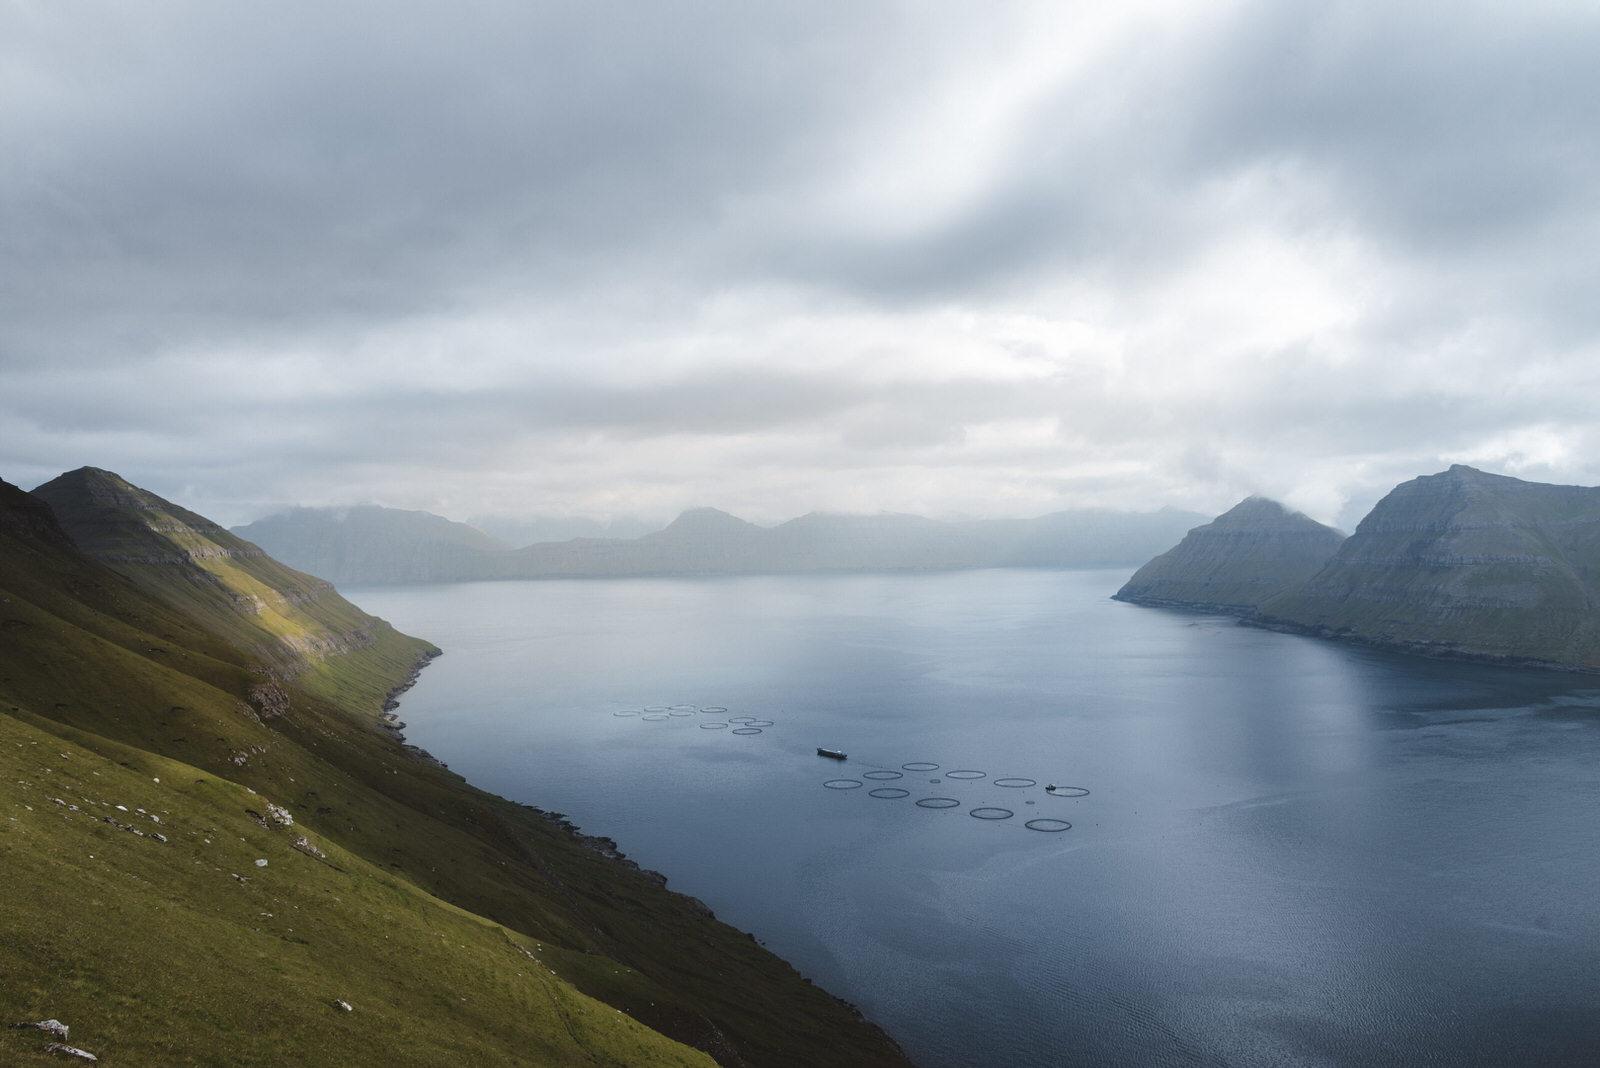 faroe islands road trip 2016 day 7 funningsfjordur